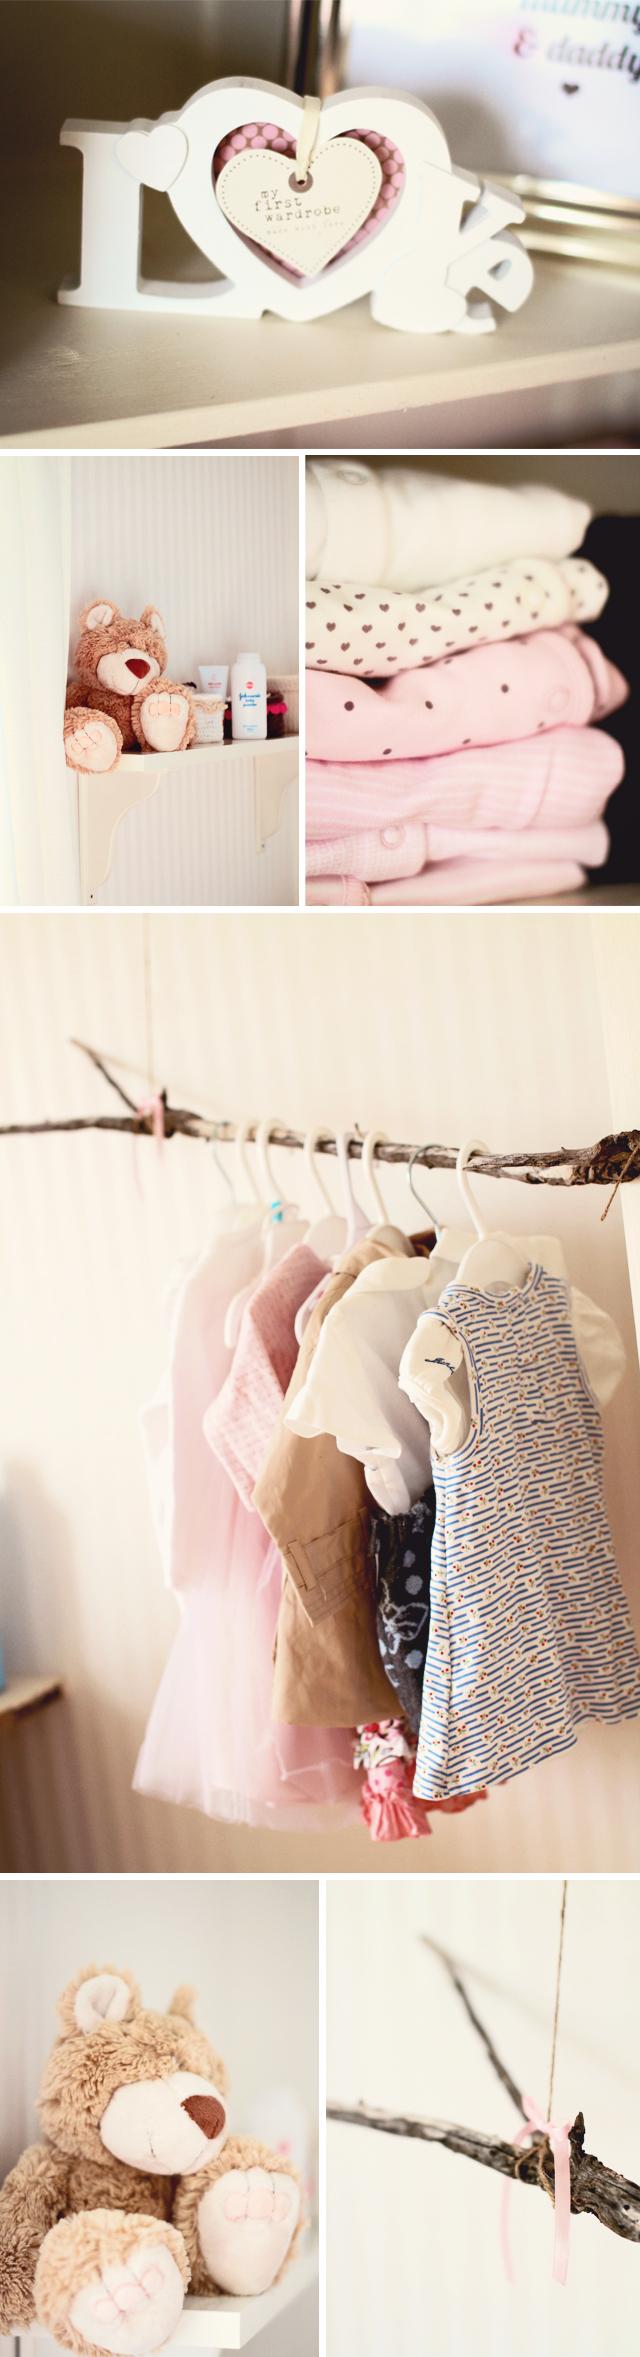 Like that branch as a clothes rod idea pregnancy u beyond